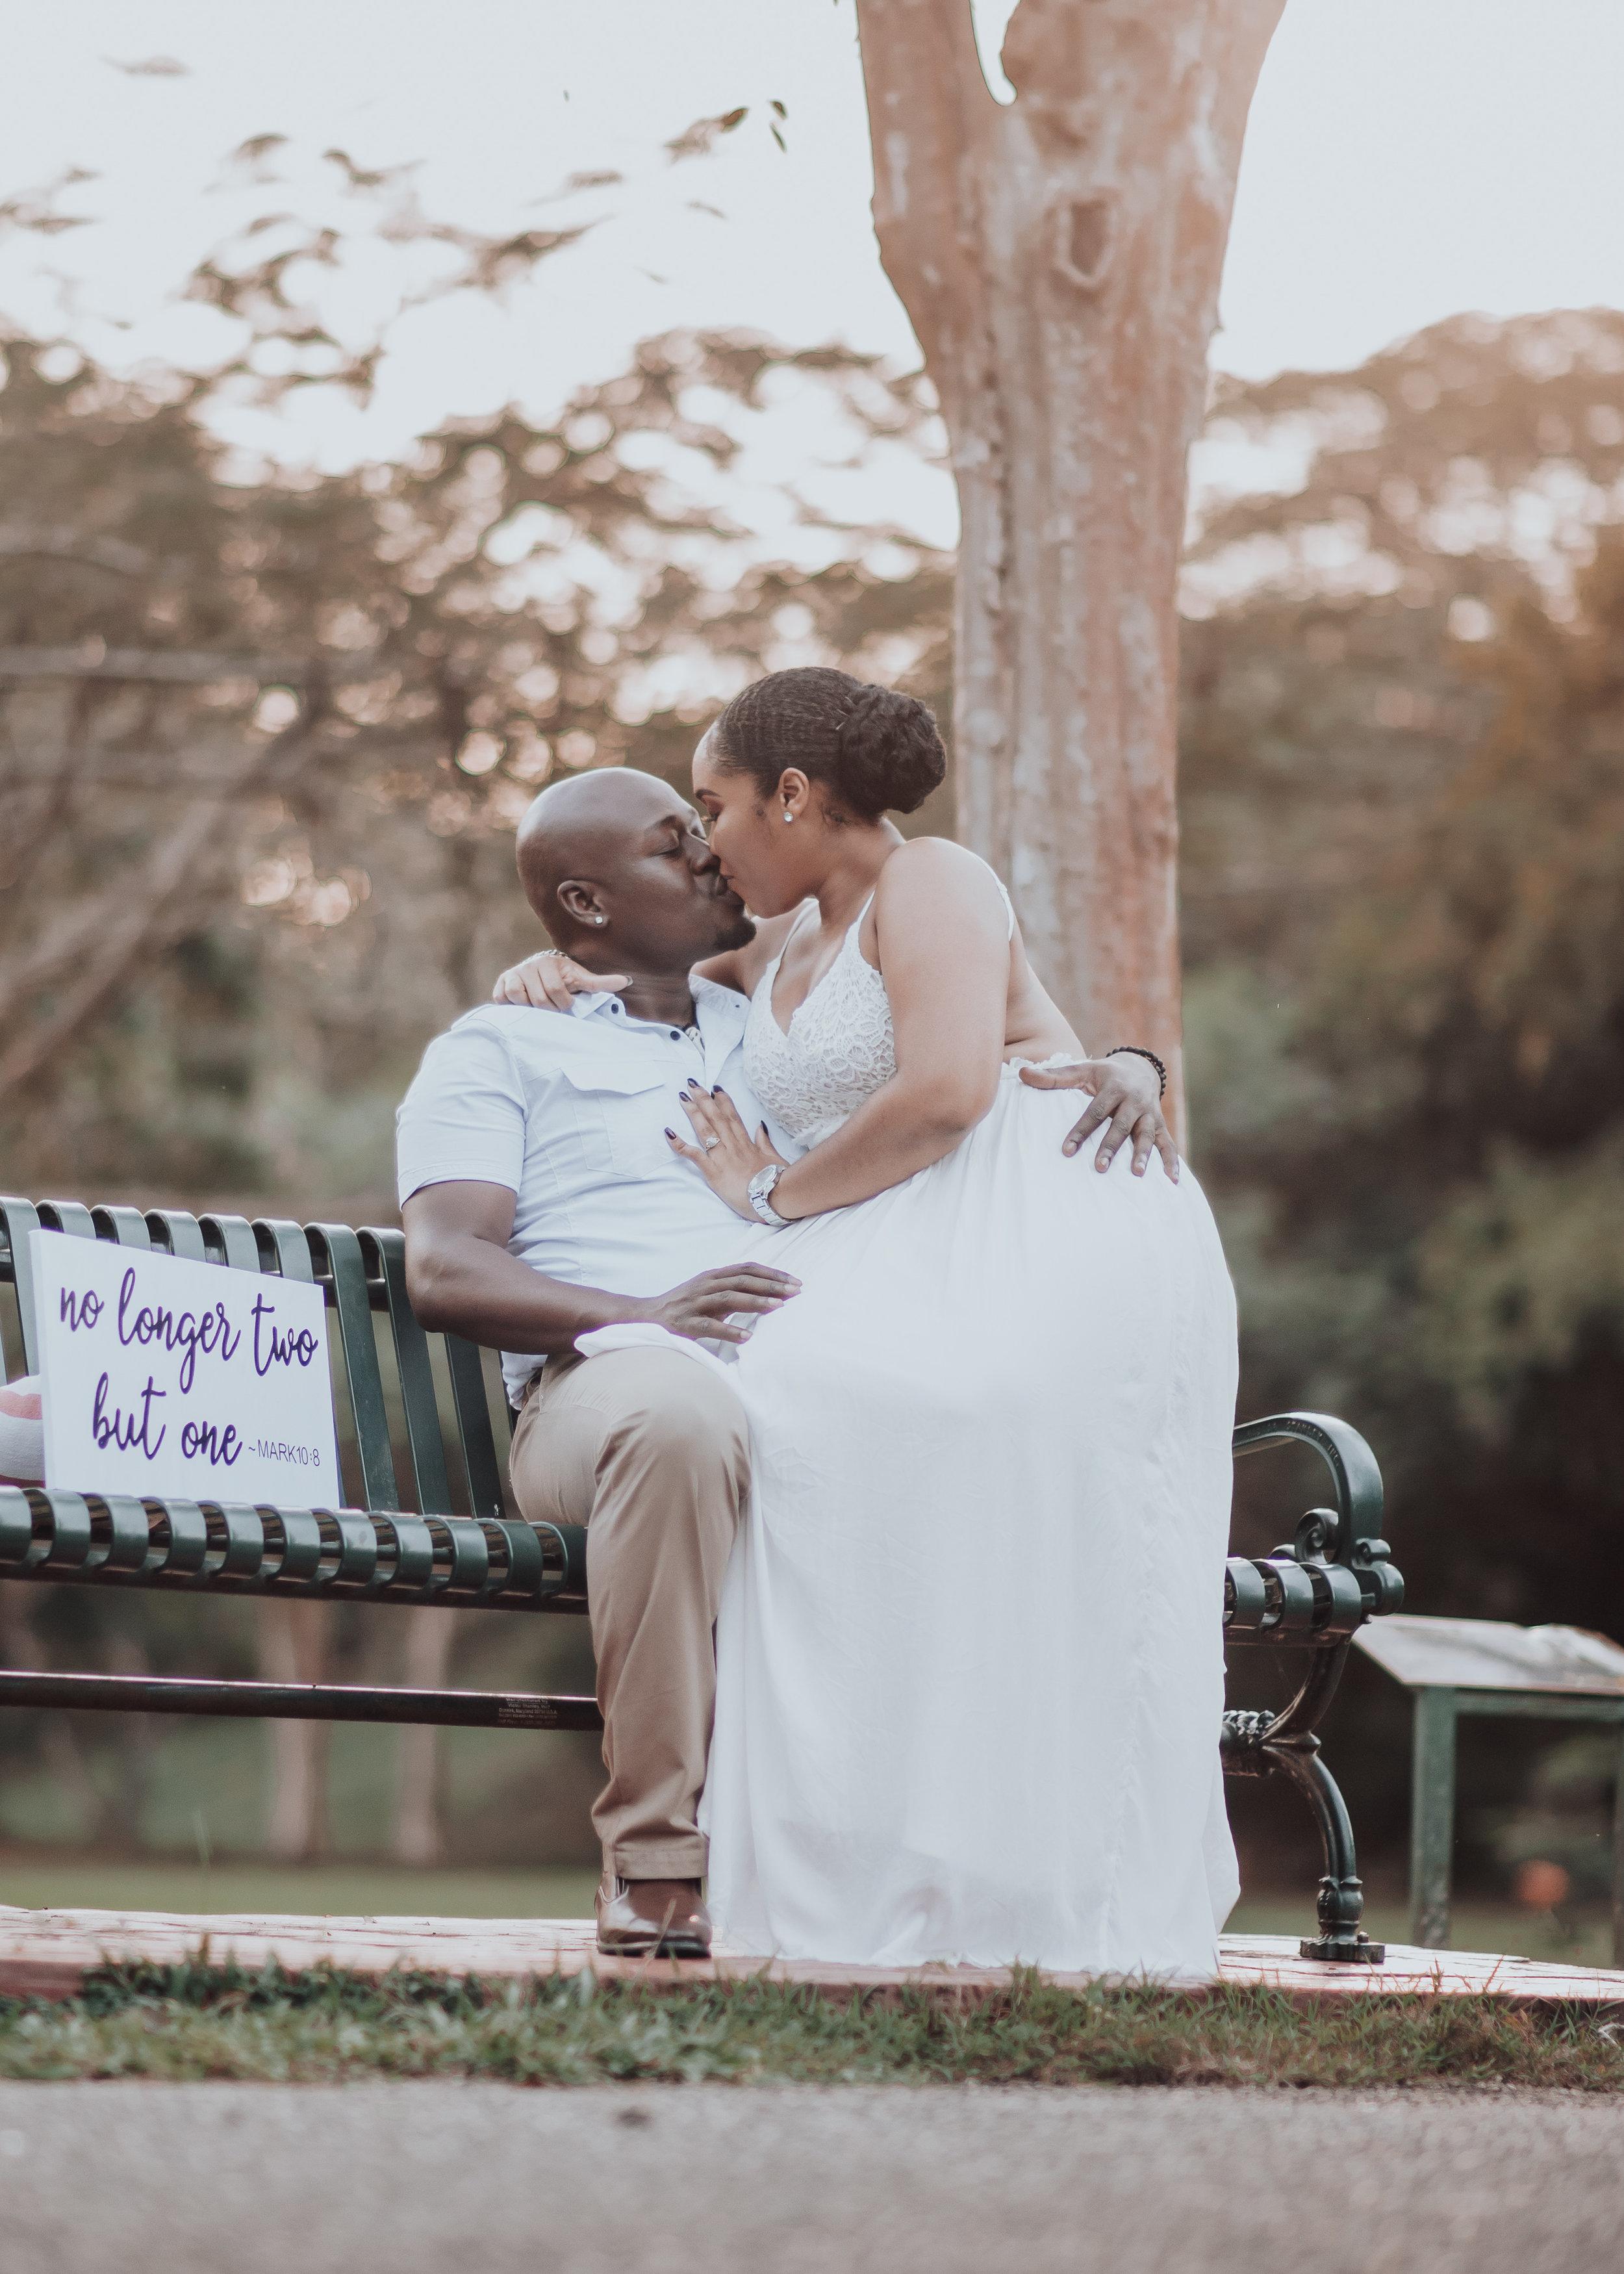 Teheila & Dominic Engagement-59.jpg